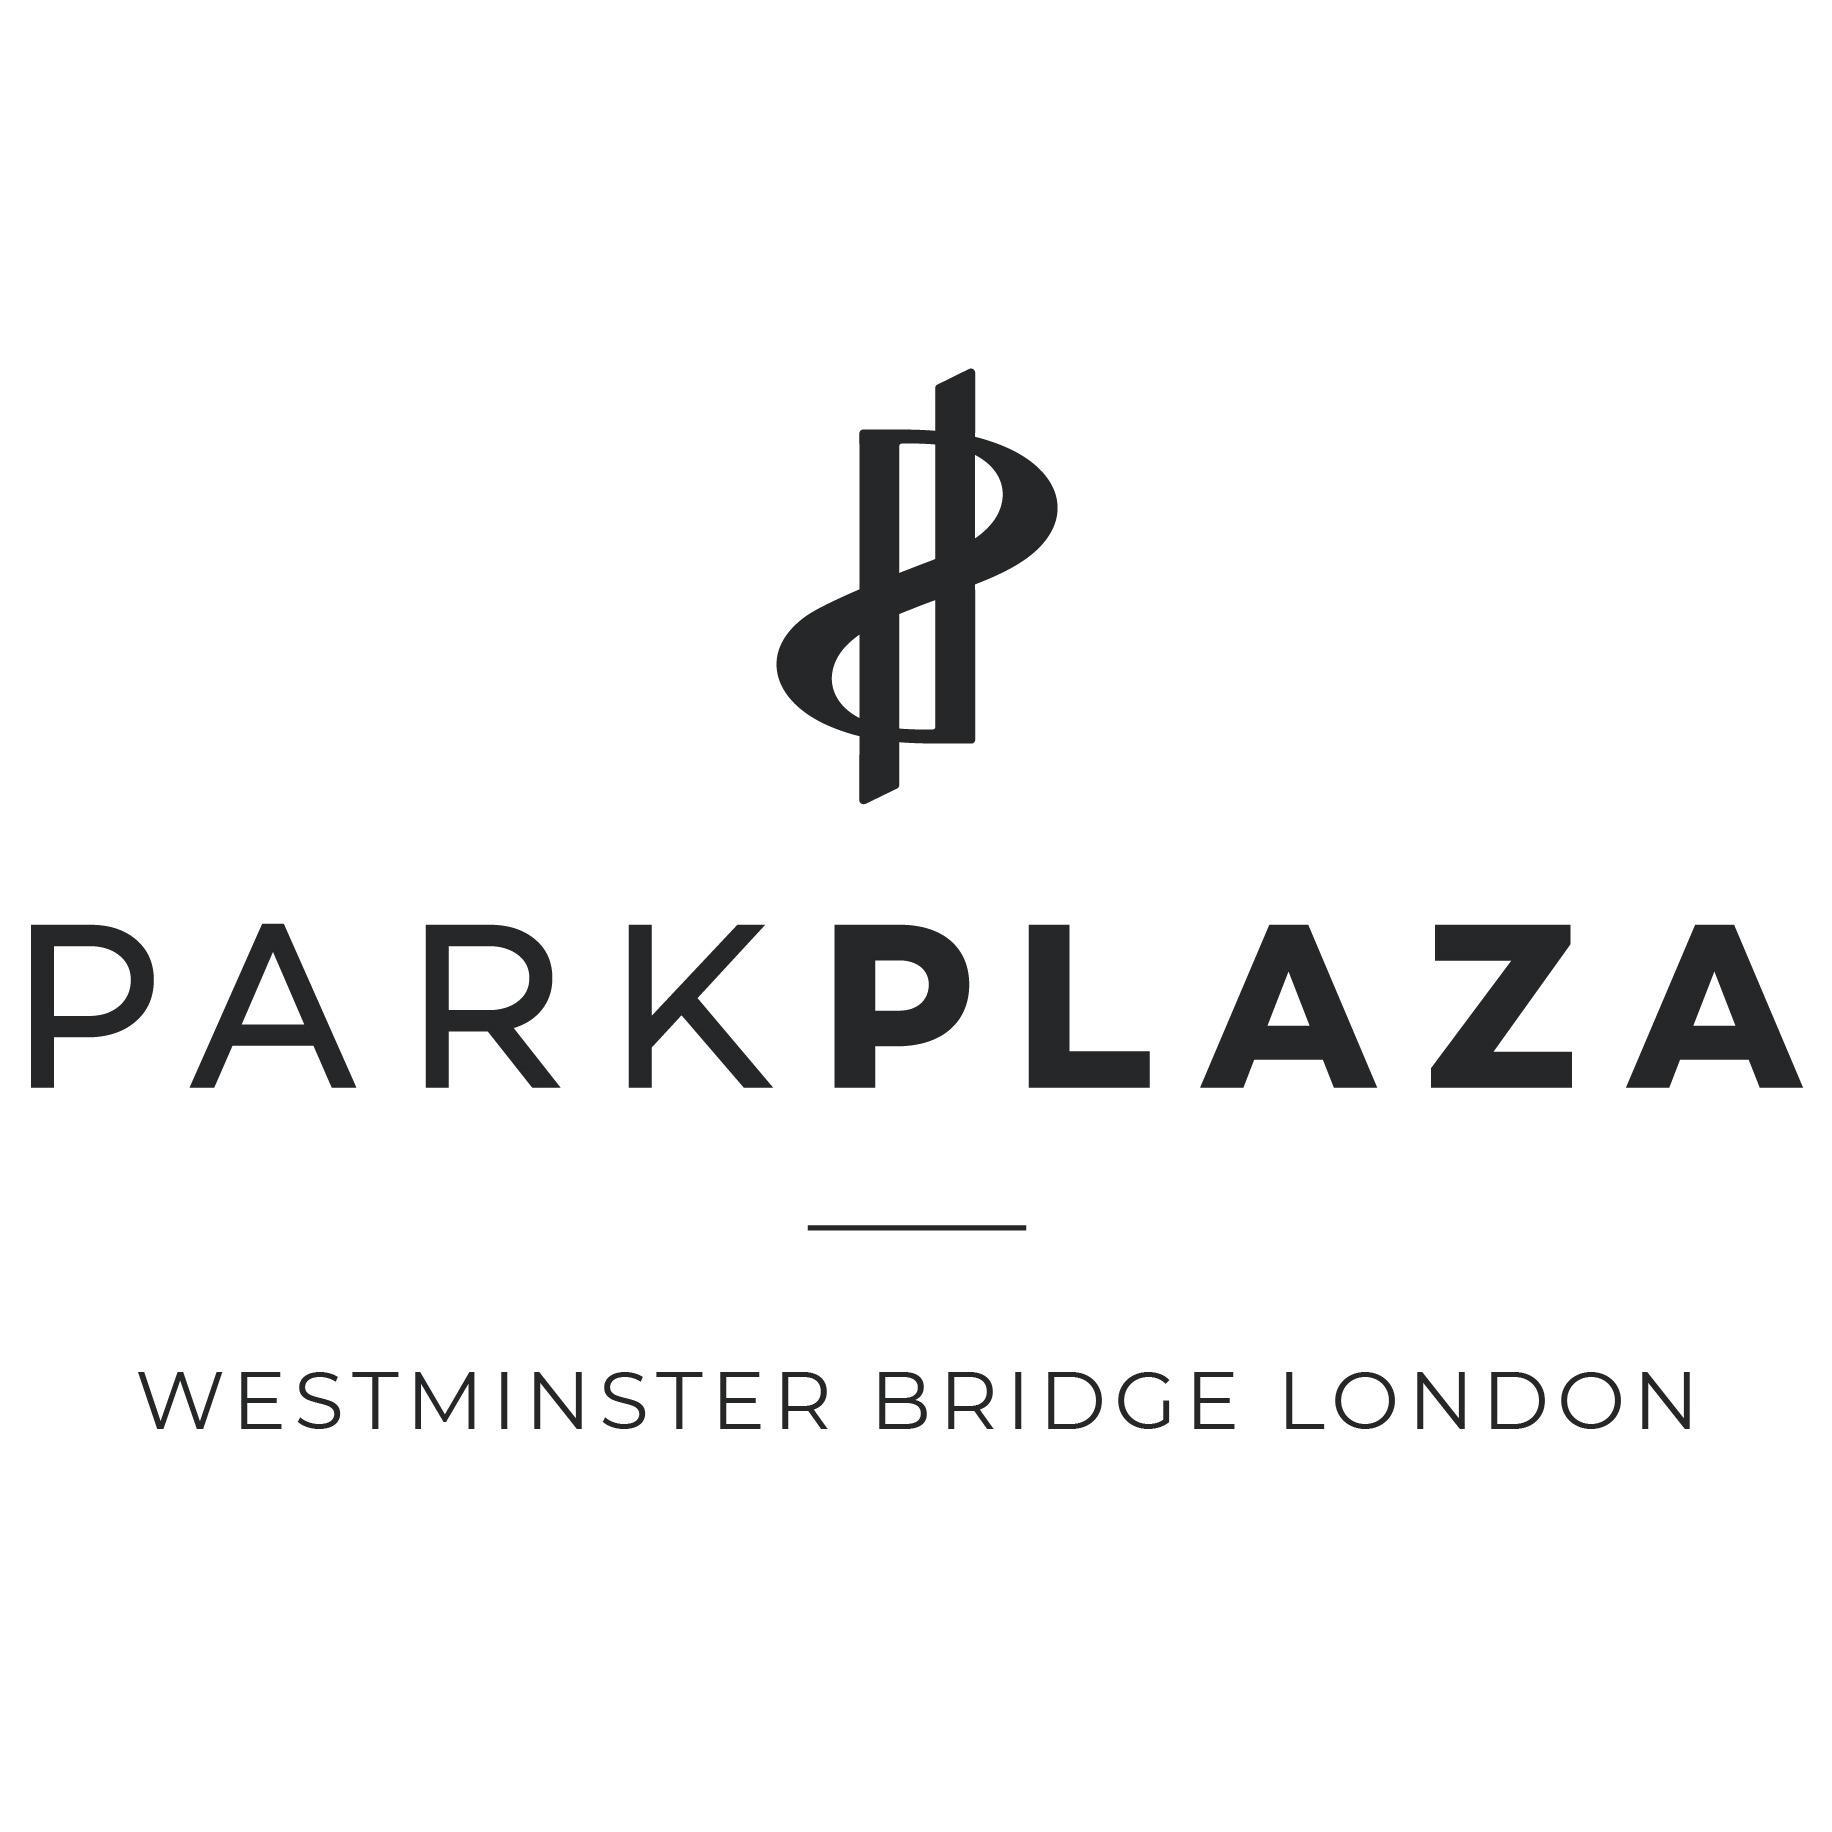 Park Plaza Westminster Bridge London